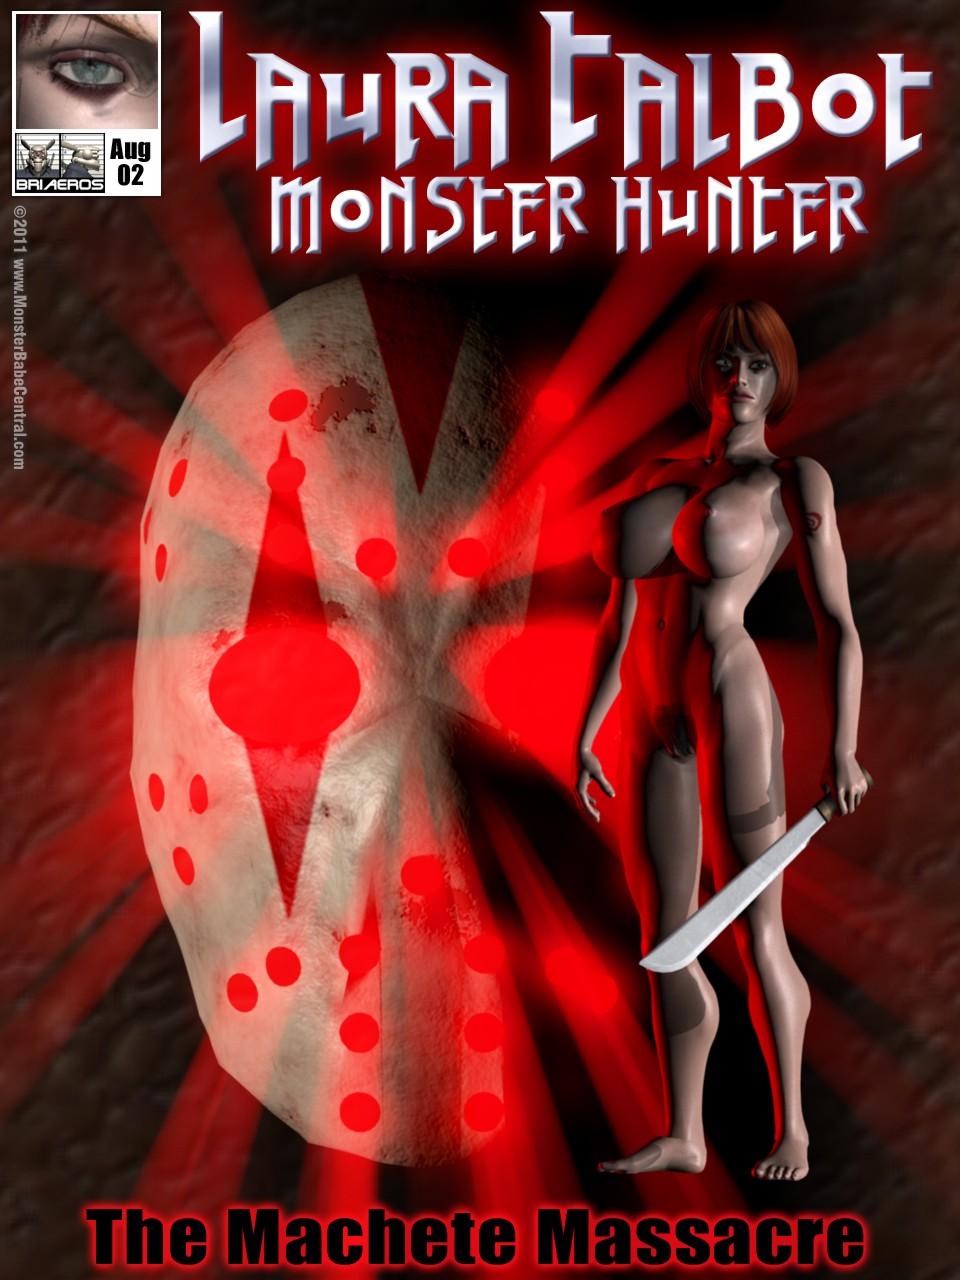 Laura Talbot Monster Hunter – Issue 2 porn comics 8 muses